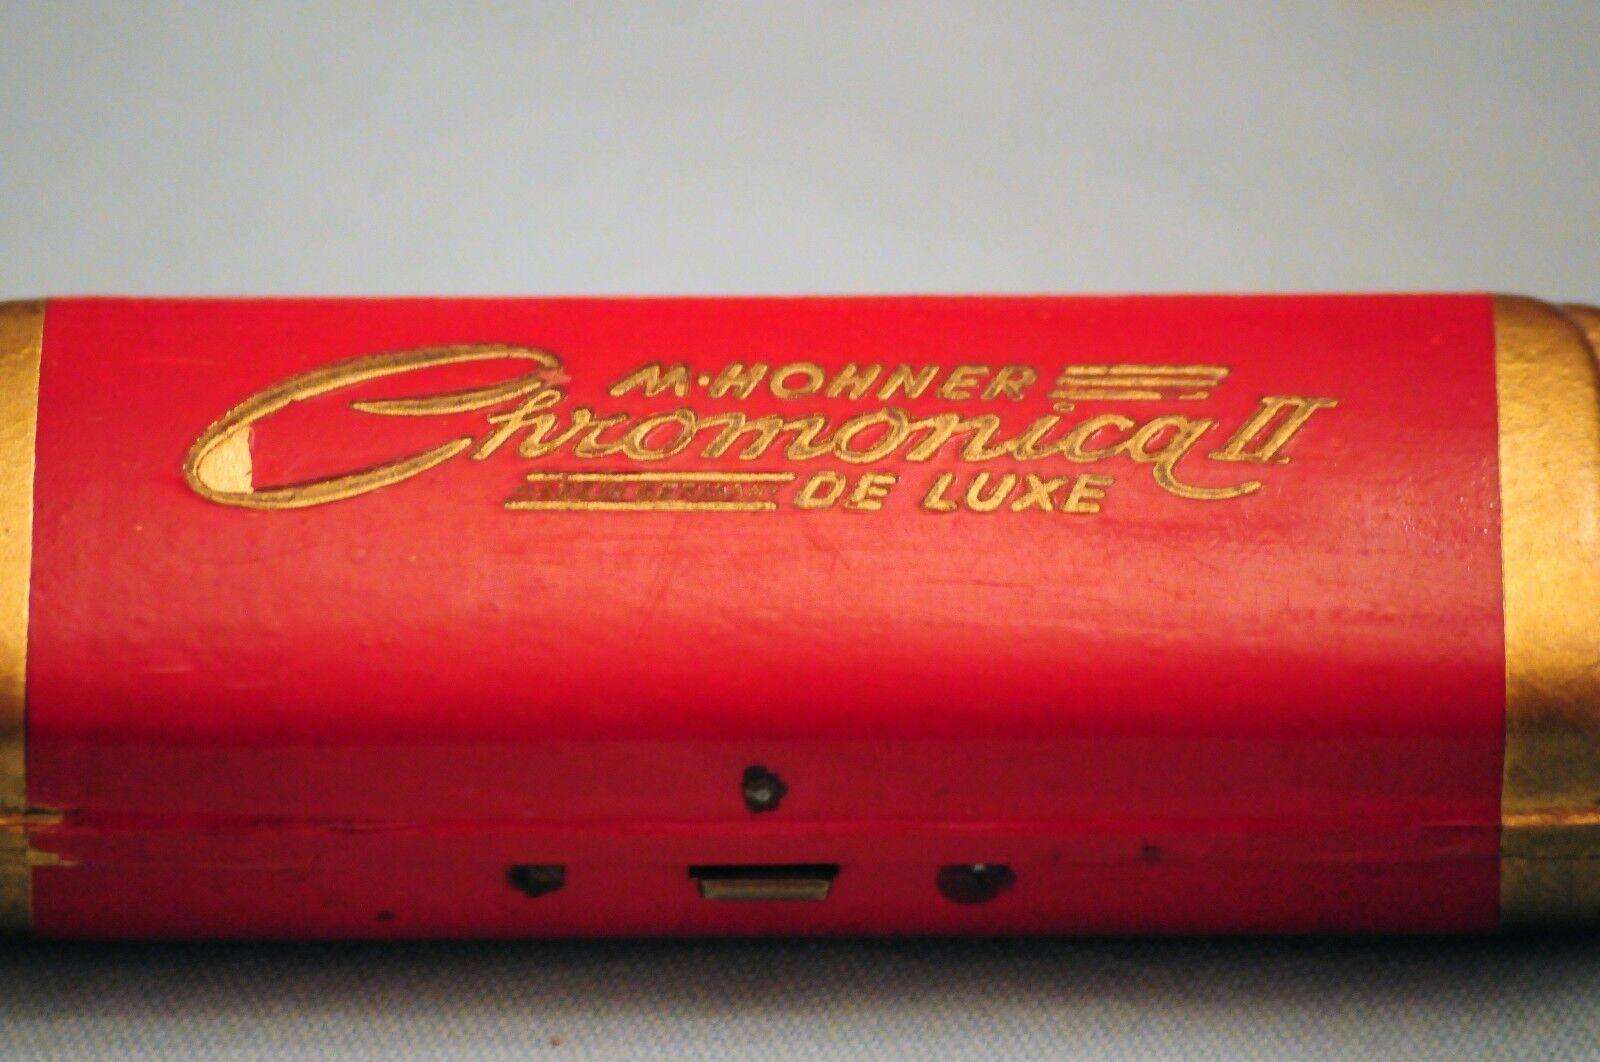 Hohner Chromonika II de Luxe 1950er Jahre